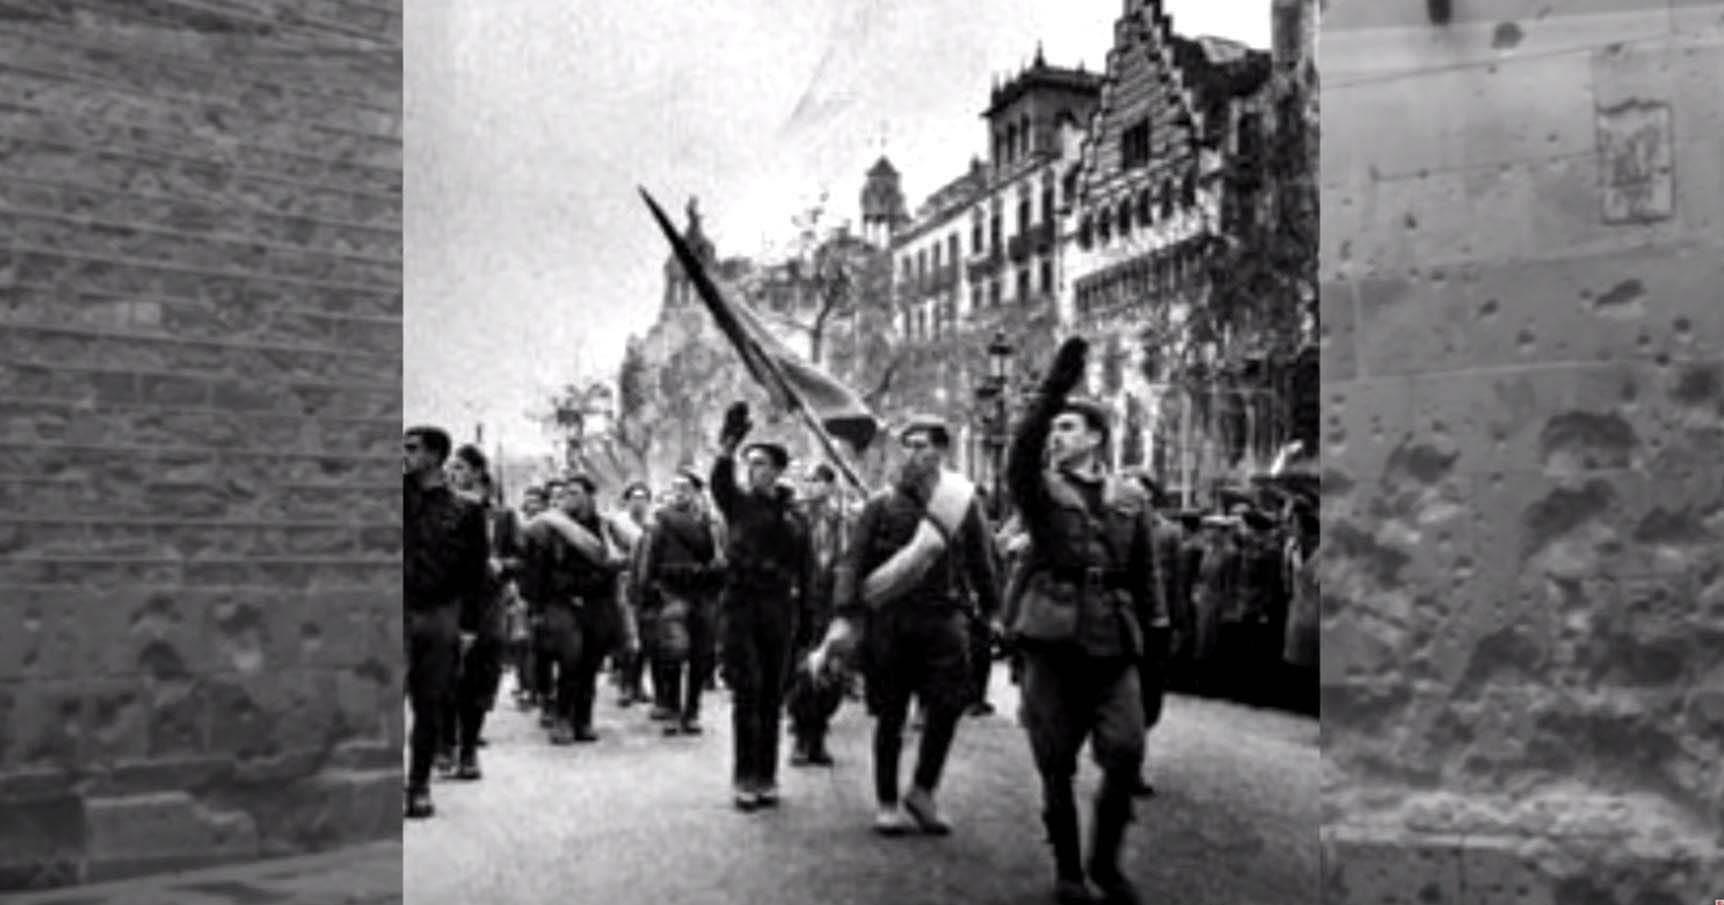 Civil War in Spain in 1965